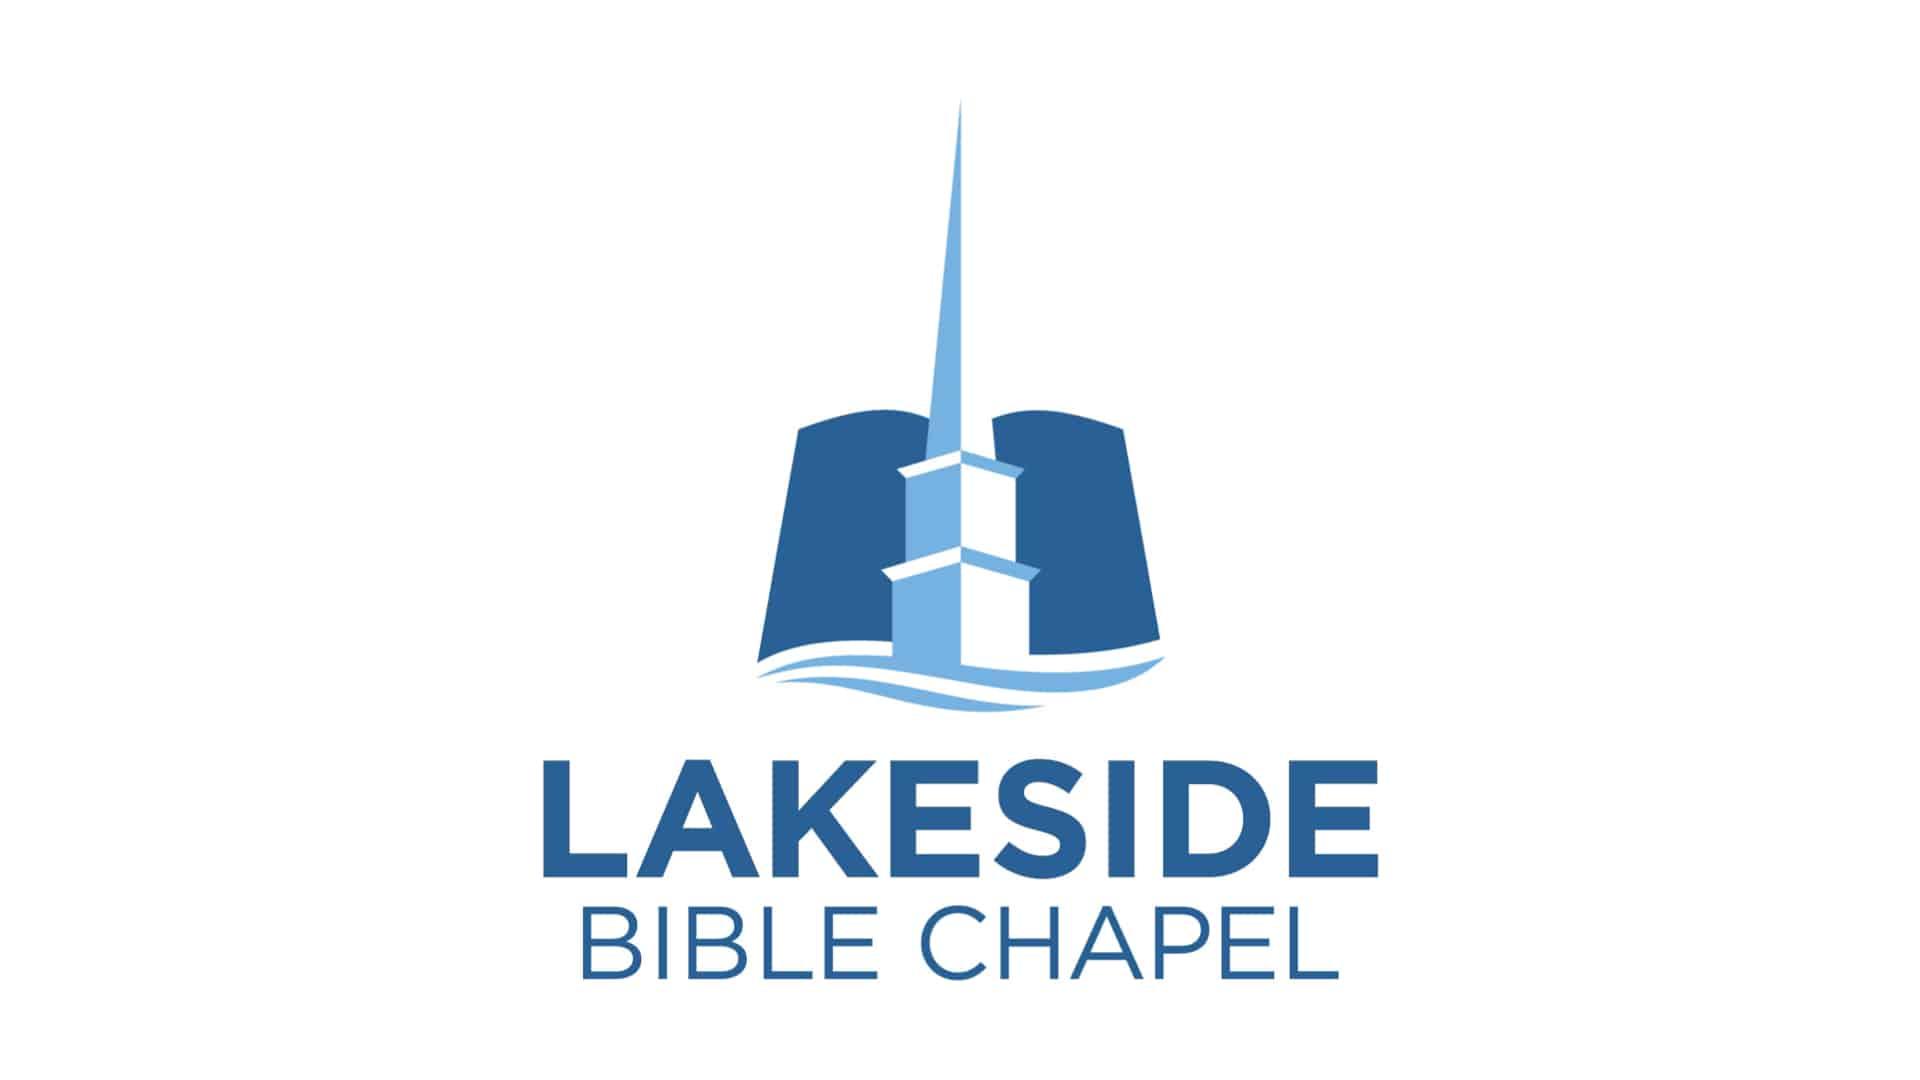 Lakeside Bible Chapel